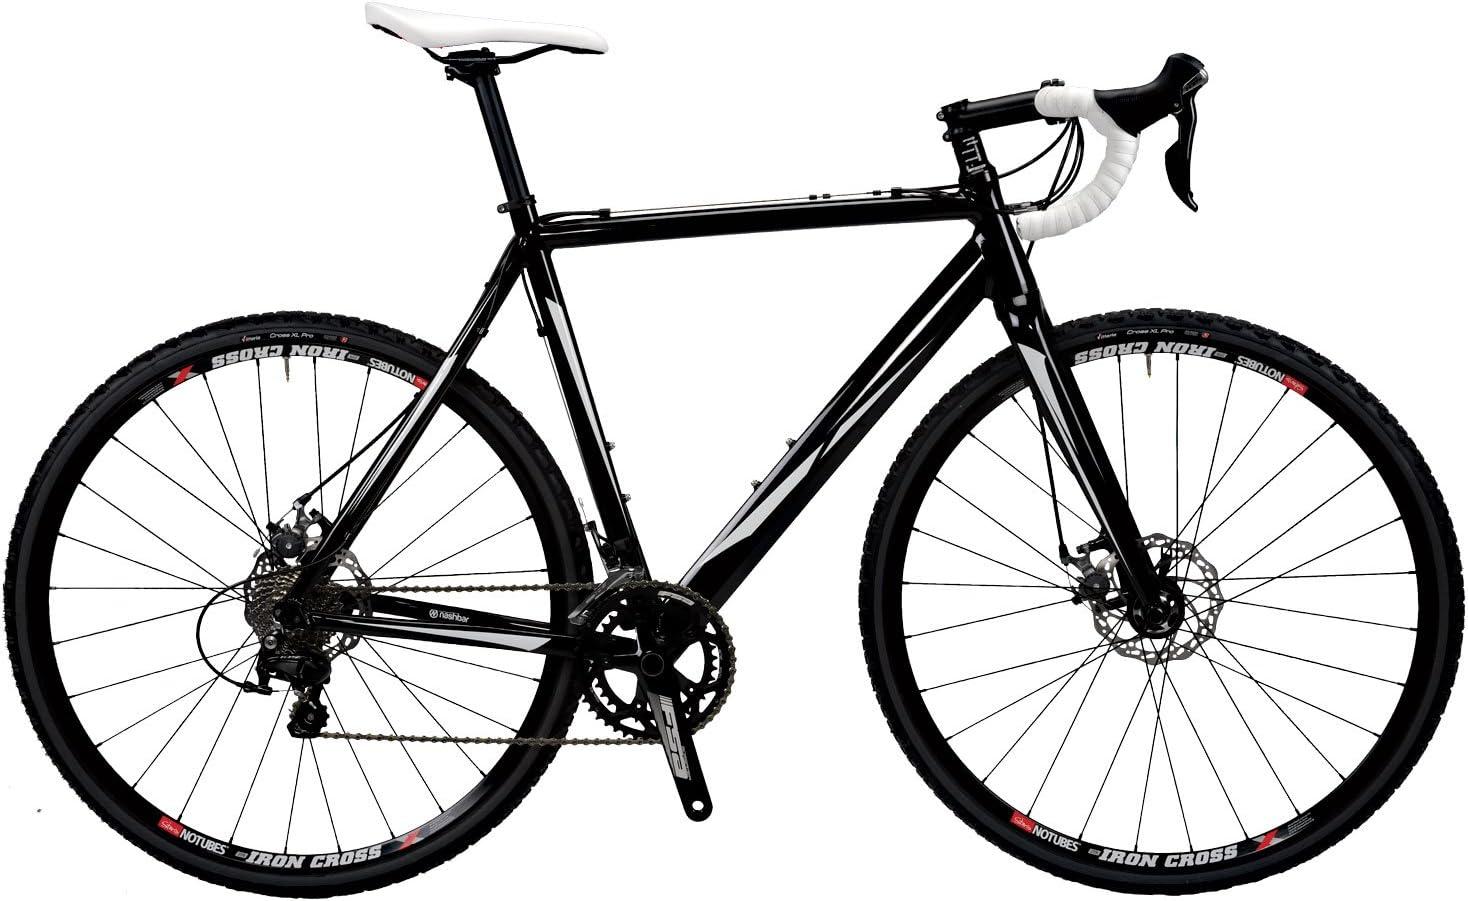 Nashbar 105 Cyclocross Bike - 54 CM